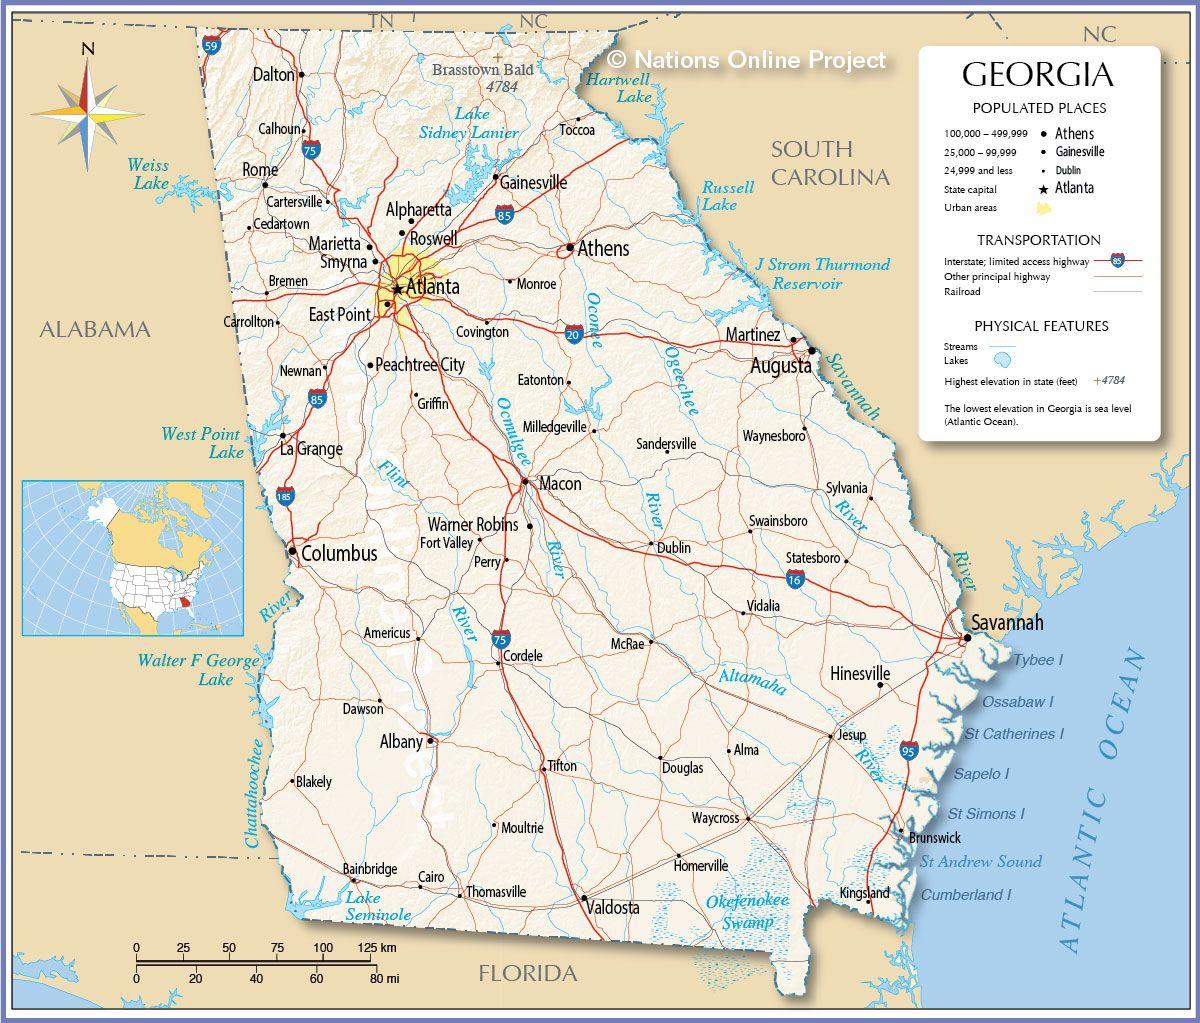 map of georgia | Reference Map Of Georgia Ga | Map of ... Map Of Georgia on map of italy, blue ridge georgia, dallas georgia, map of africa, map of texas, map of michigan, marietta georgia, map of the world, roswell georgia, albany georgia, jekyll island georgia, kennesaw georgia, map of south america, map of europe, map of north carolina, map of canada, gainesville georgia, waycross georgia, map of china, map of germany, statesboro georgia, map south carolina, duluth georgia, newnan georgia, map of usa, map alabama, canton georgia, decatur georgia, plains georgia, map of virginia, savanna georgia, tifton georgia, map of mexico, map of florida, dacula georgia, map of the united states, map of ohio,